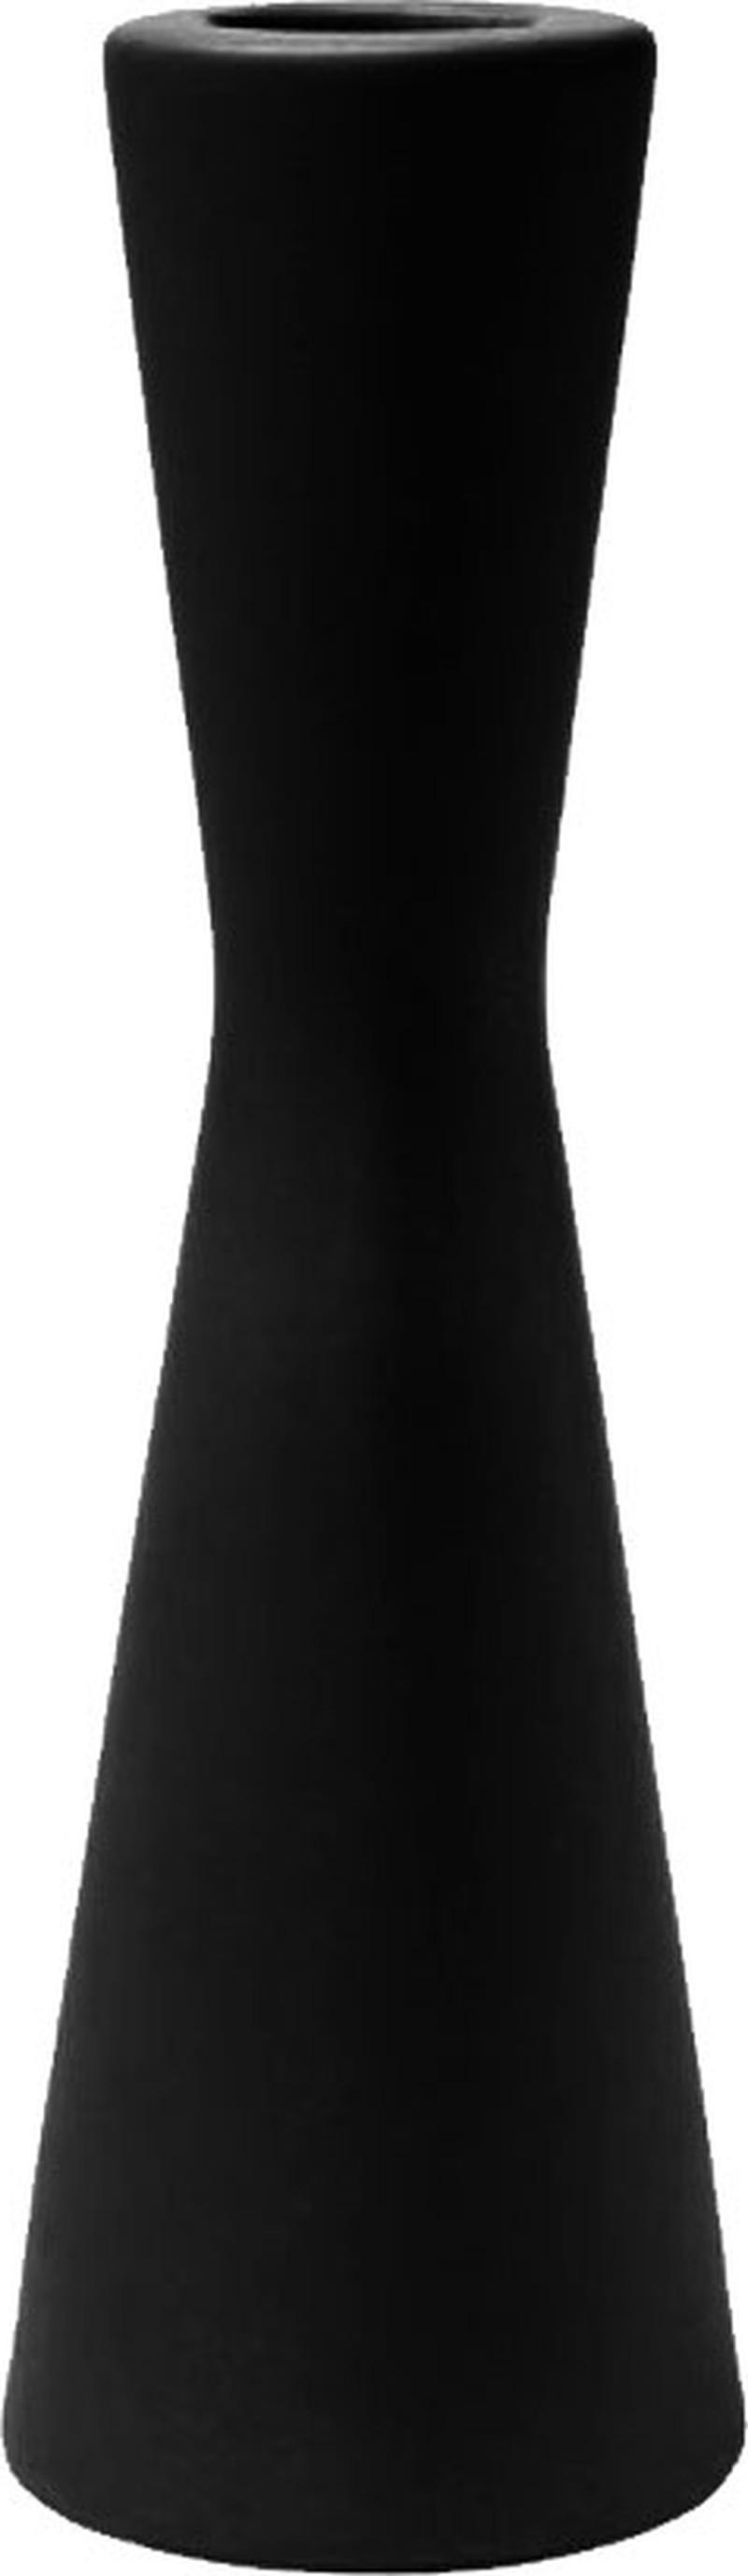 Laura kandelaar - Mat zwart - 6,5 x 21 cm -